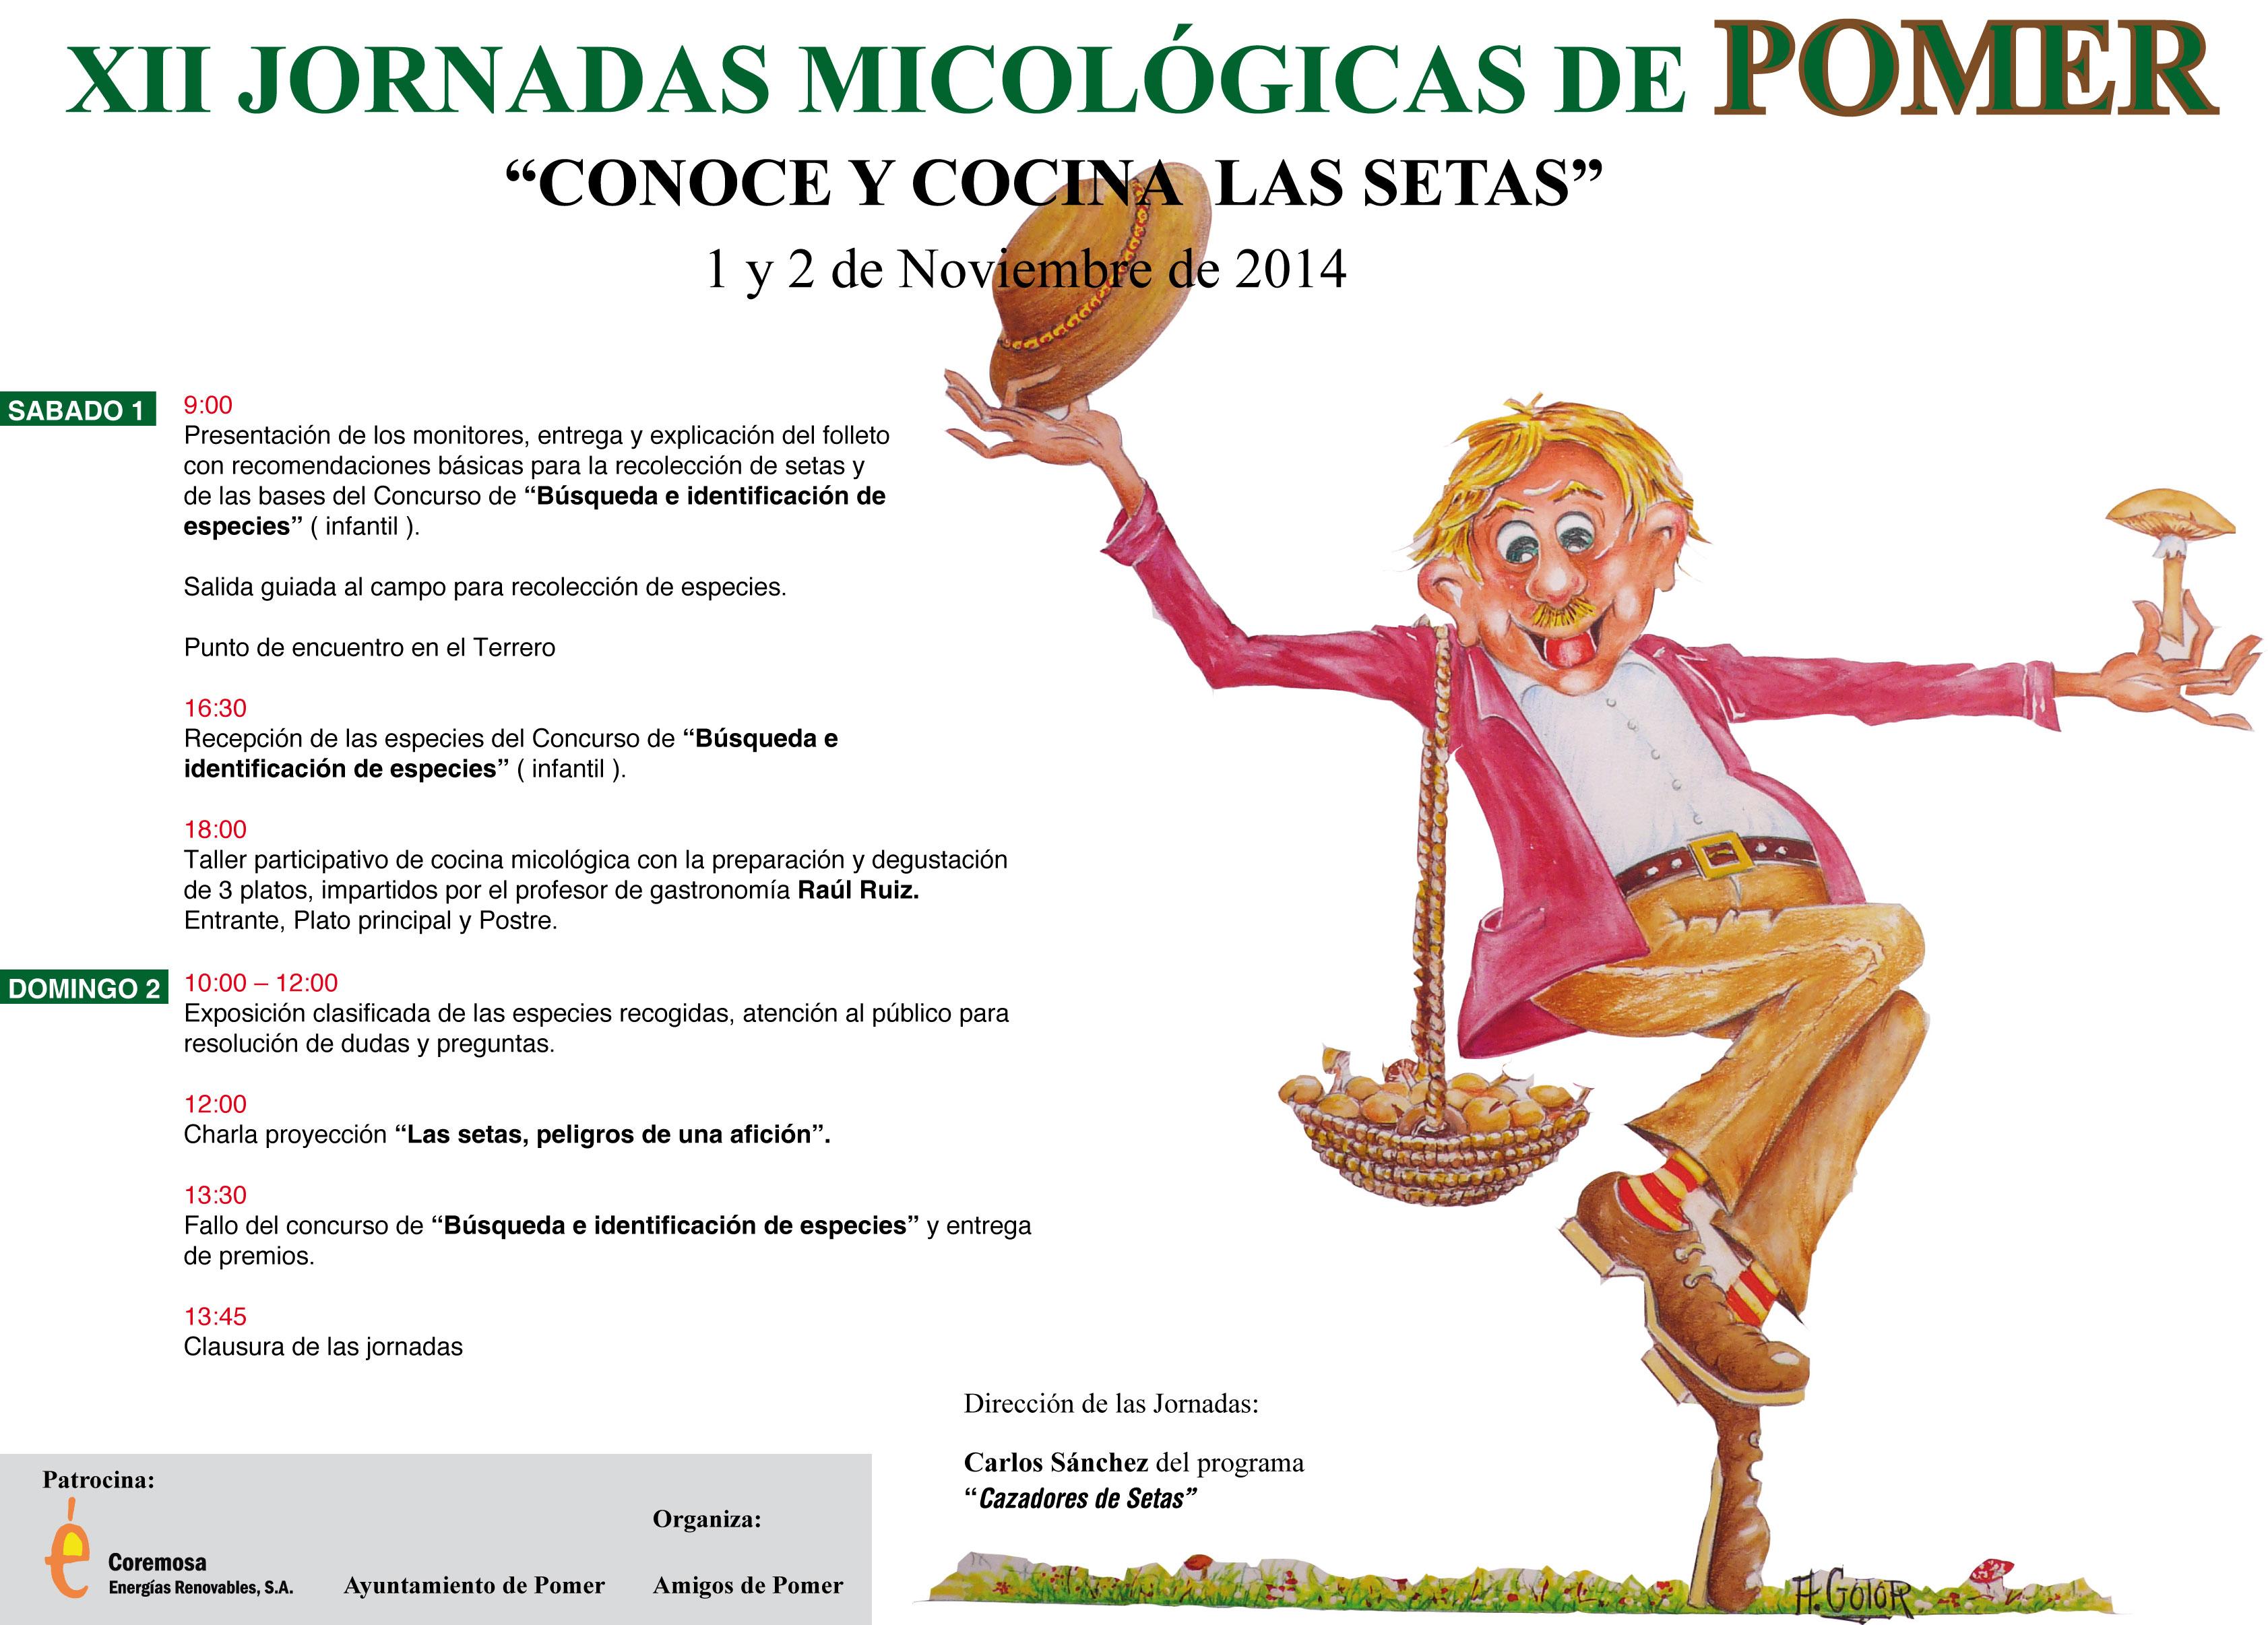 XII_JORNADAS_MICOLOGICAS